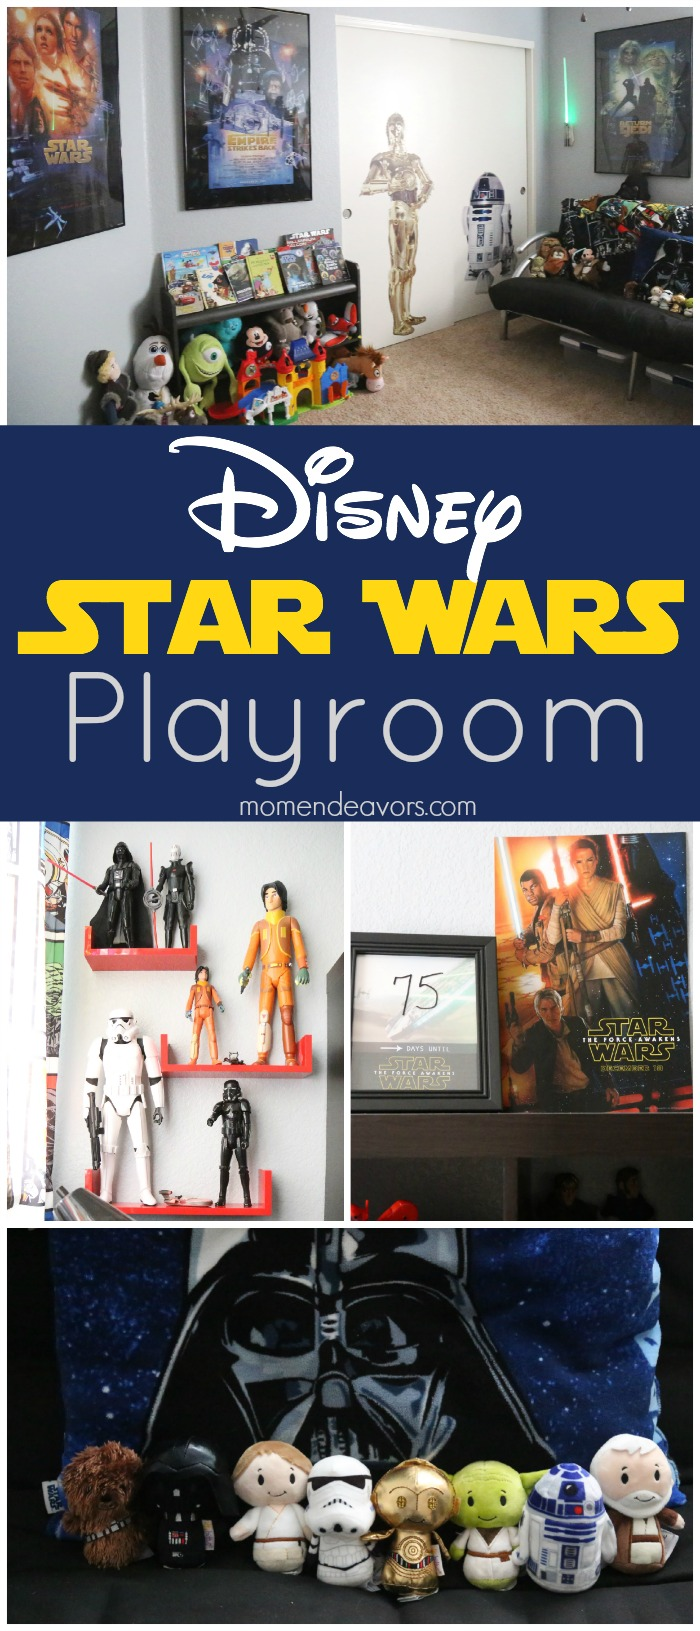 Disney Star Wars Playroom